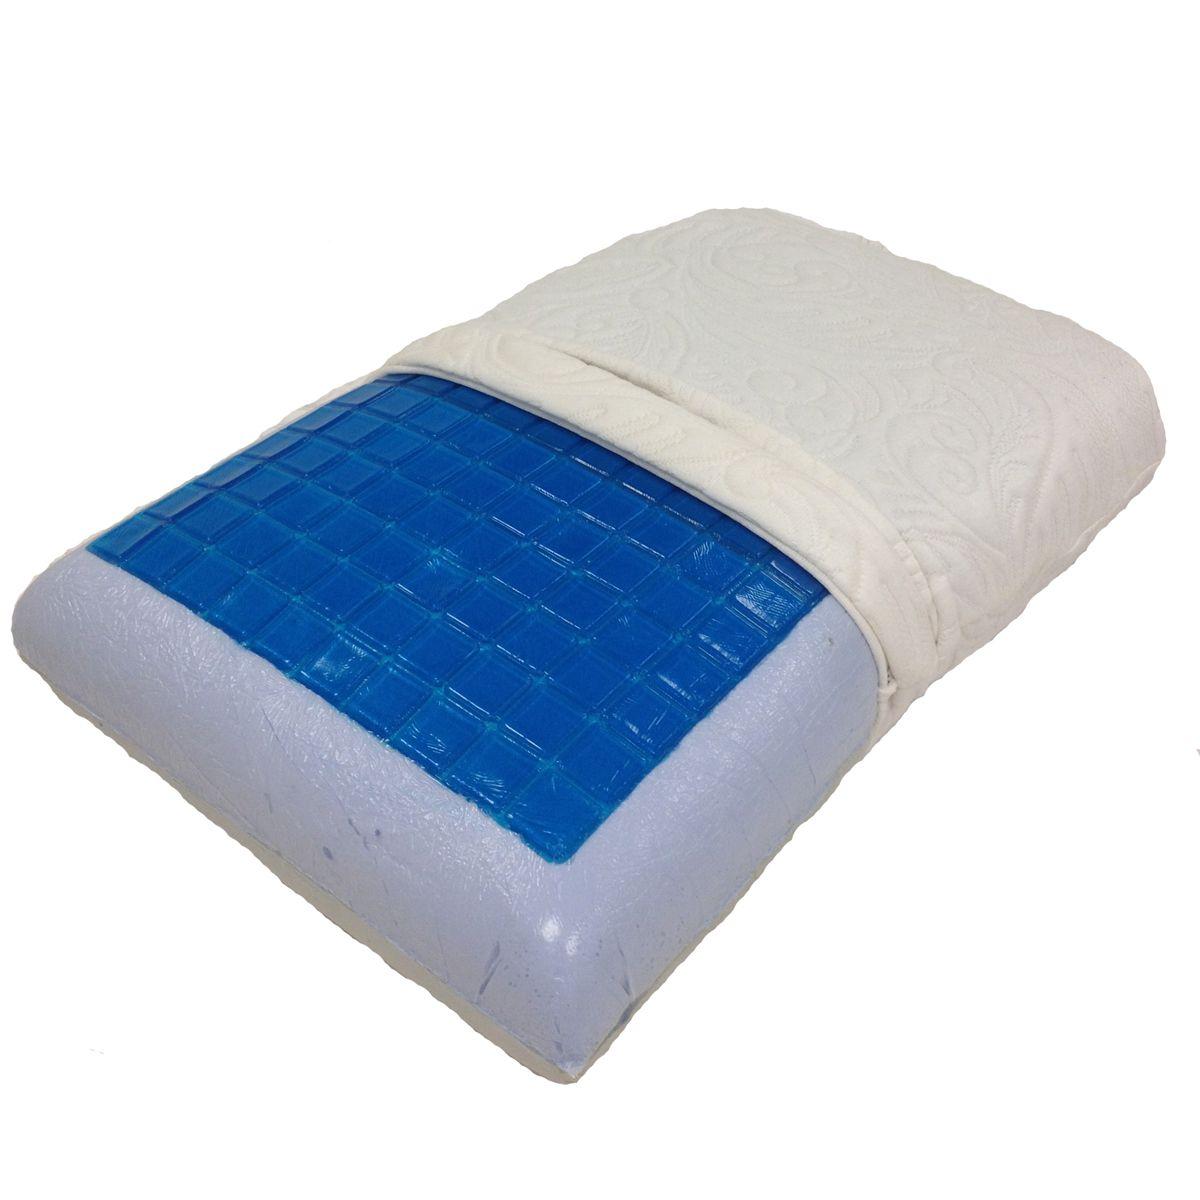 Single Standard Size Hybrid Symphony Memory Foam Pillow by Abripedic